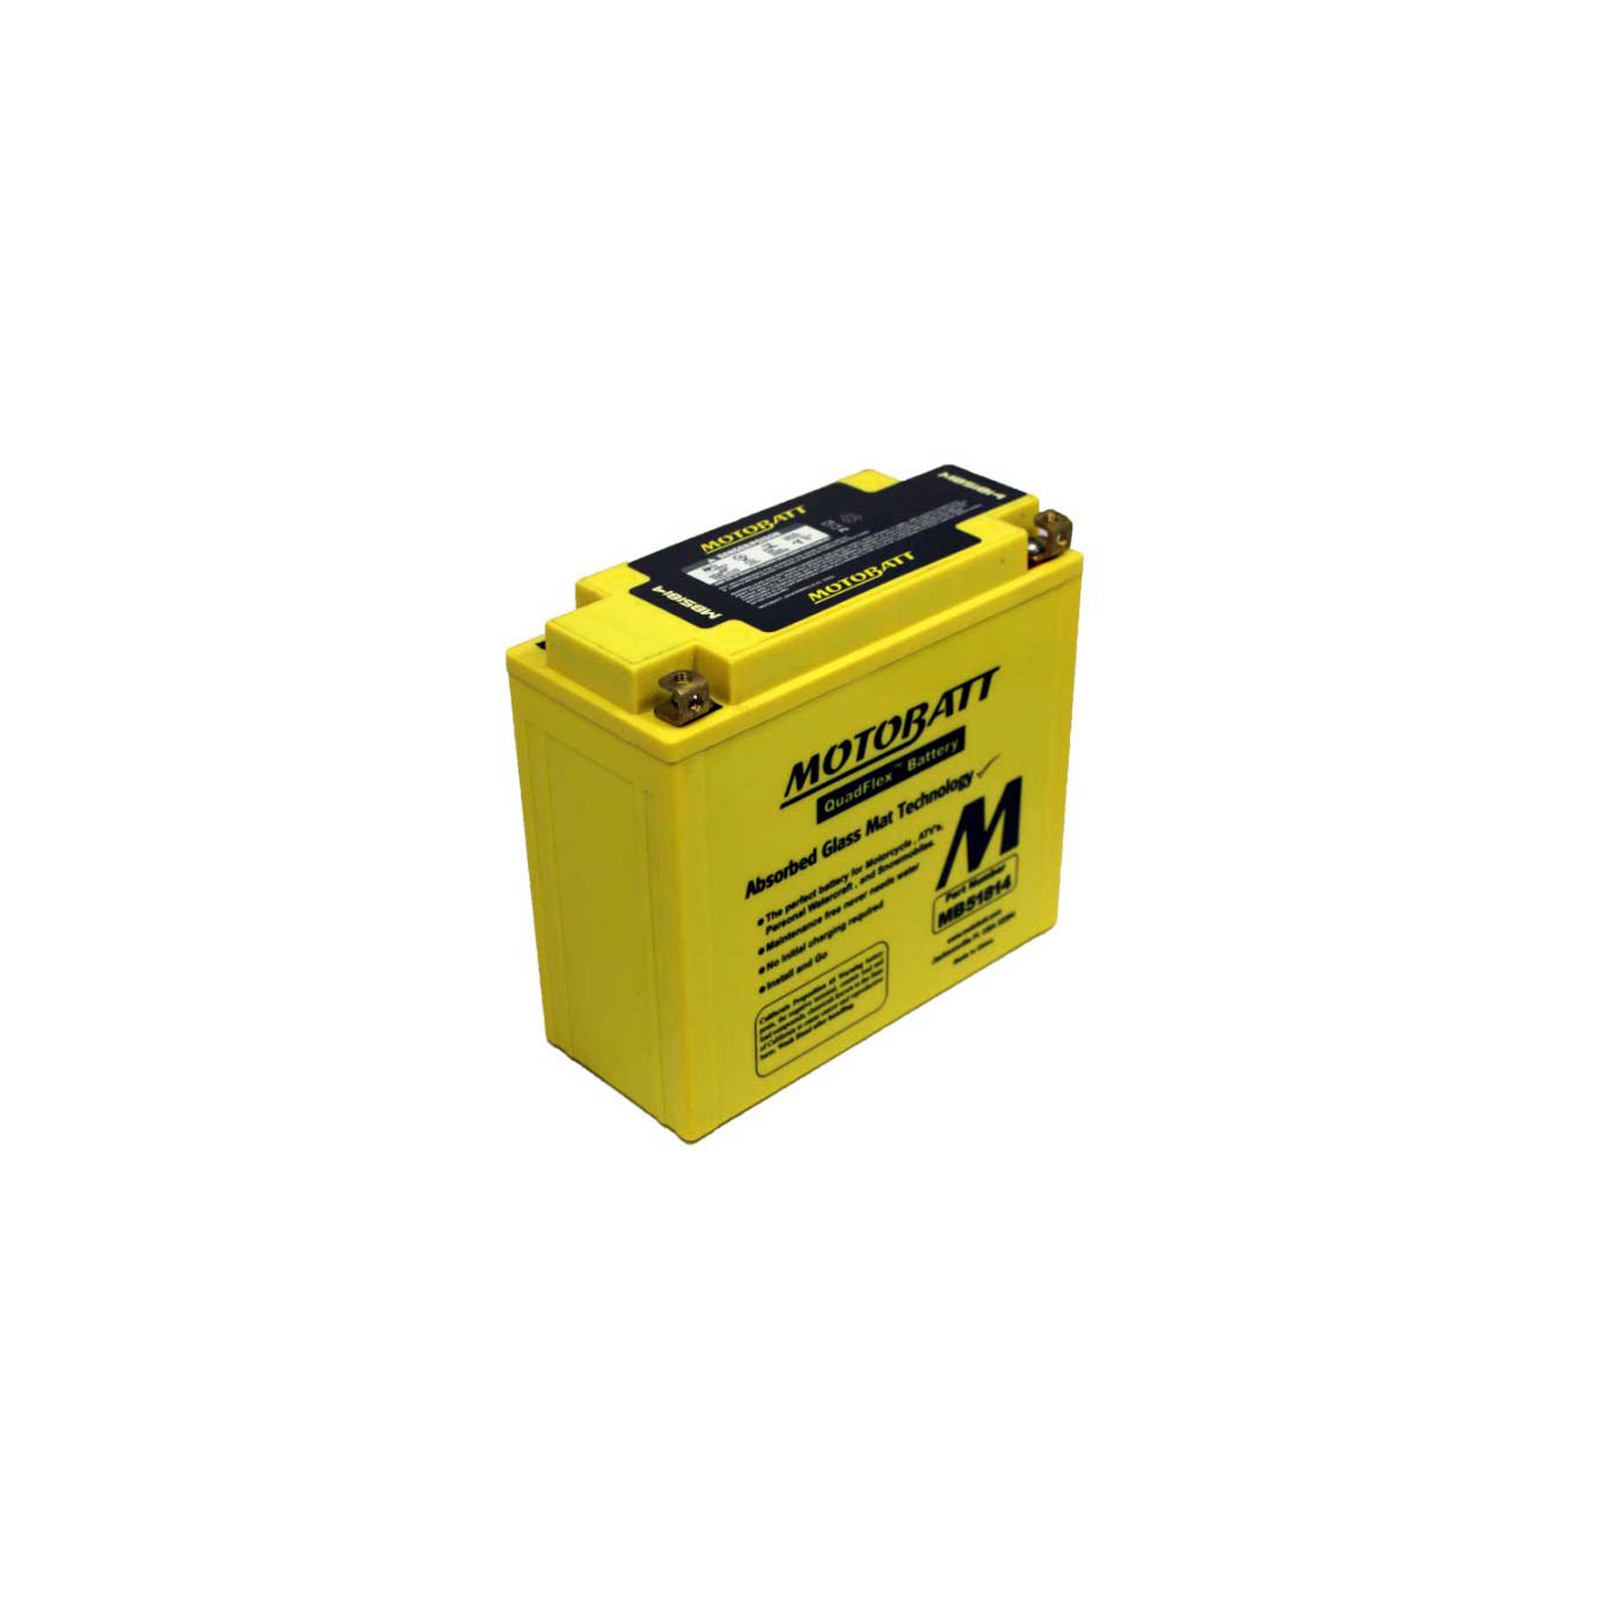 Motobatt Mb51814 12v 22ah Motorcycle Battery Replaces